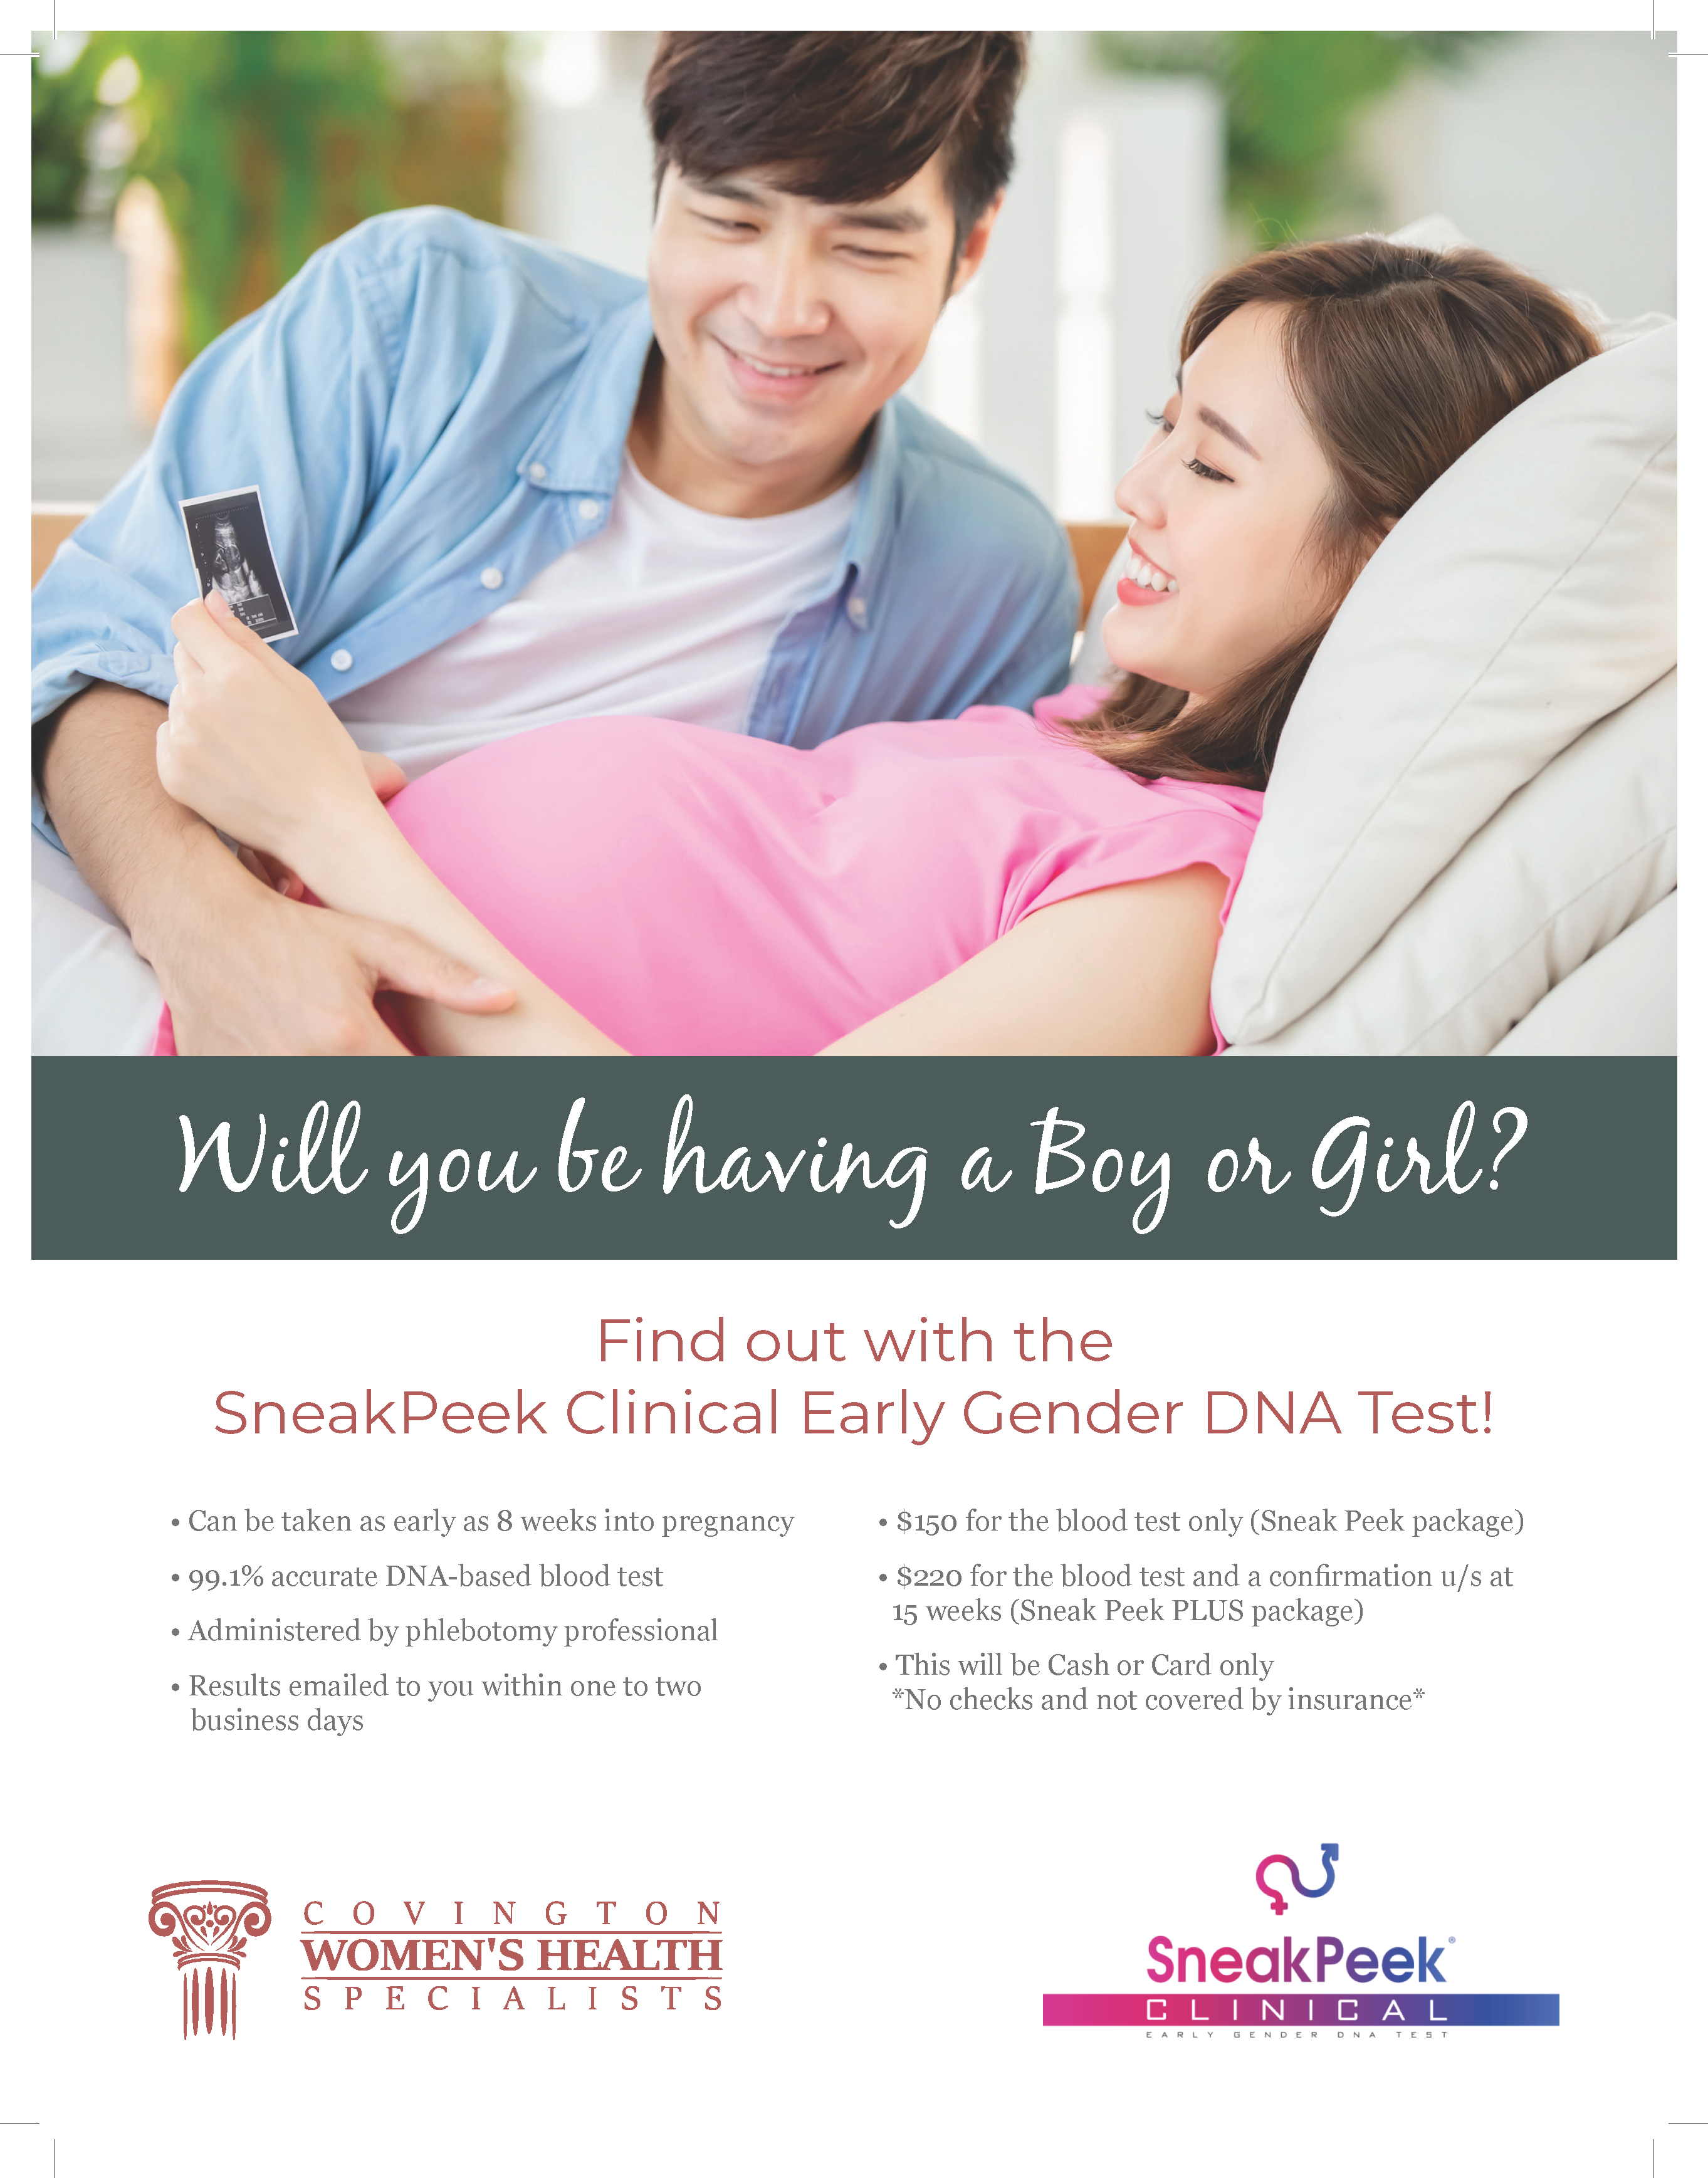 Flyer four of Covington Women's Health gender reveal service.